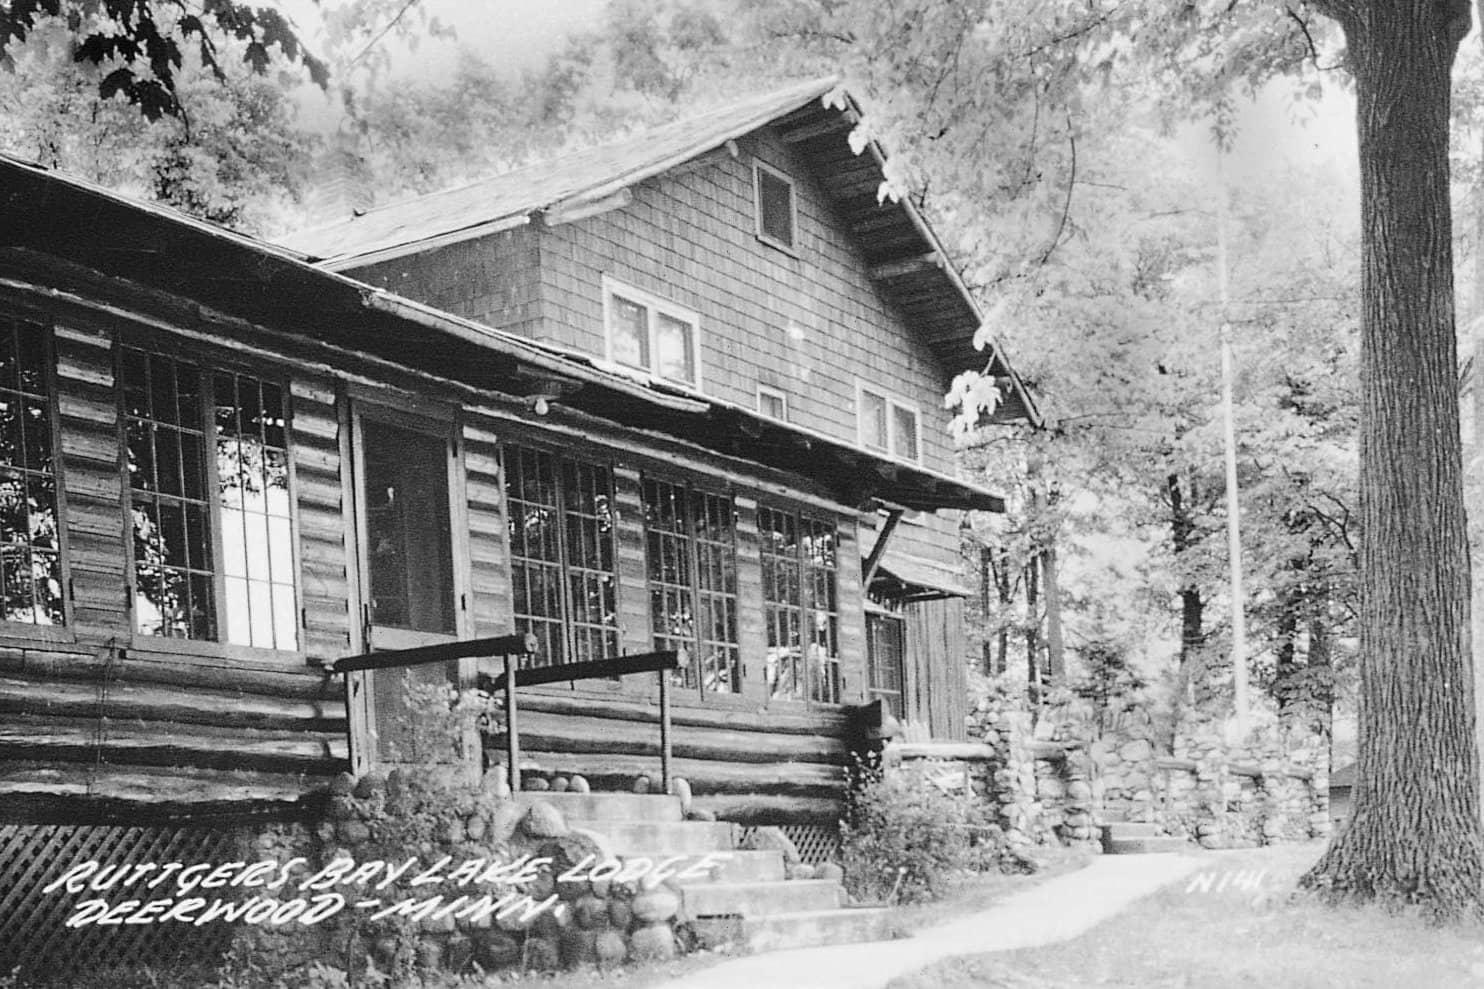 Ruttger's main lodge exterior